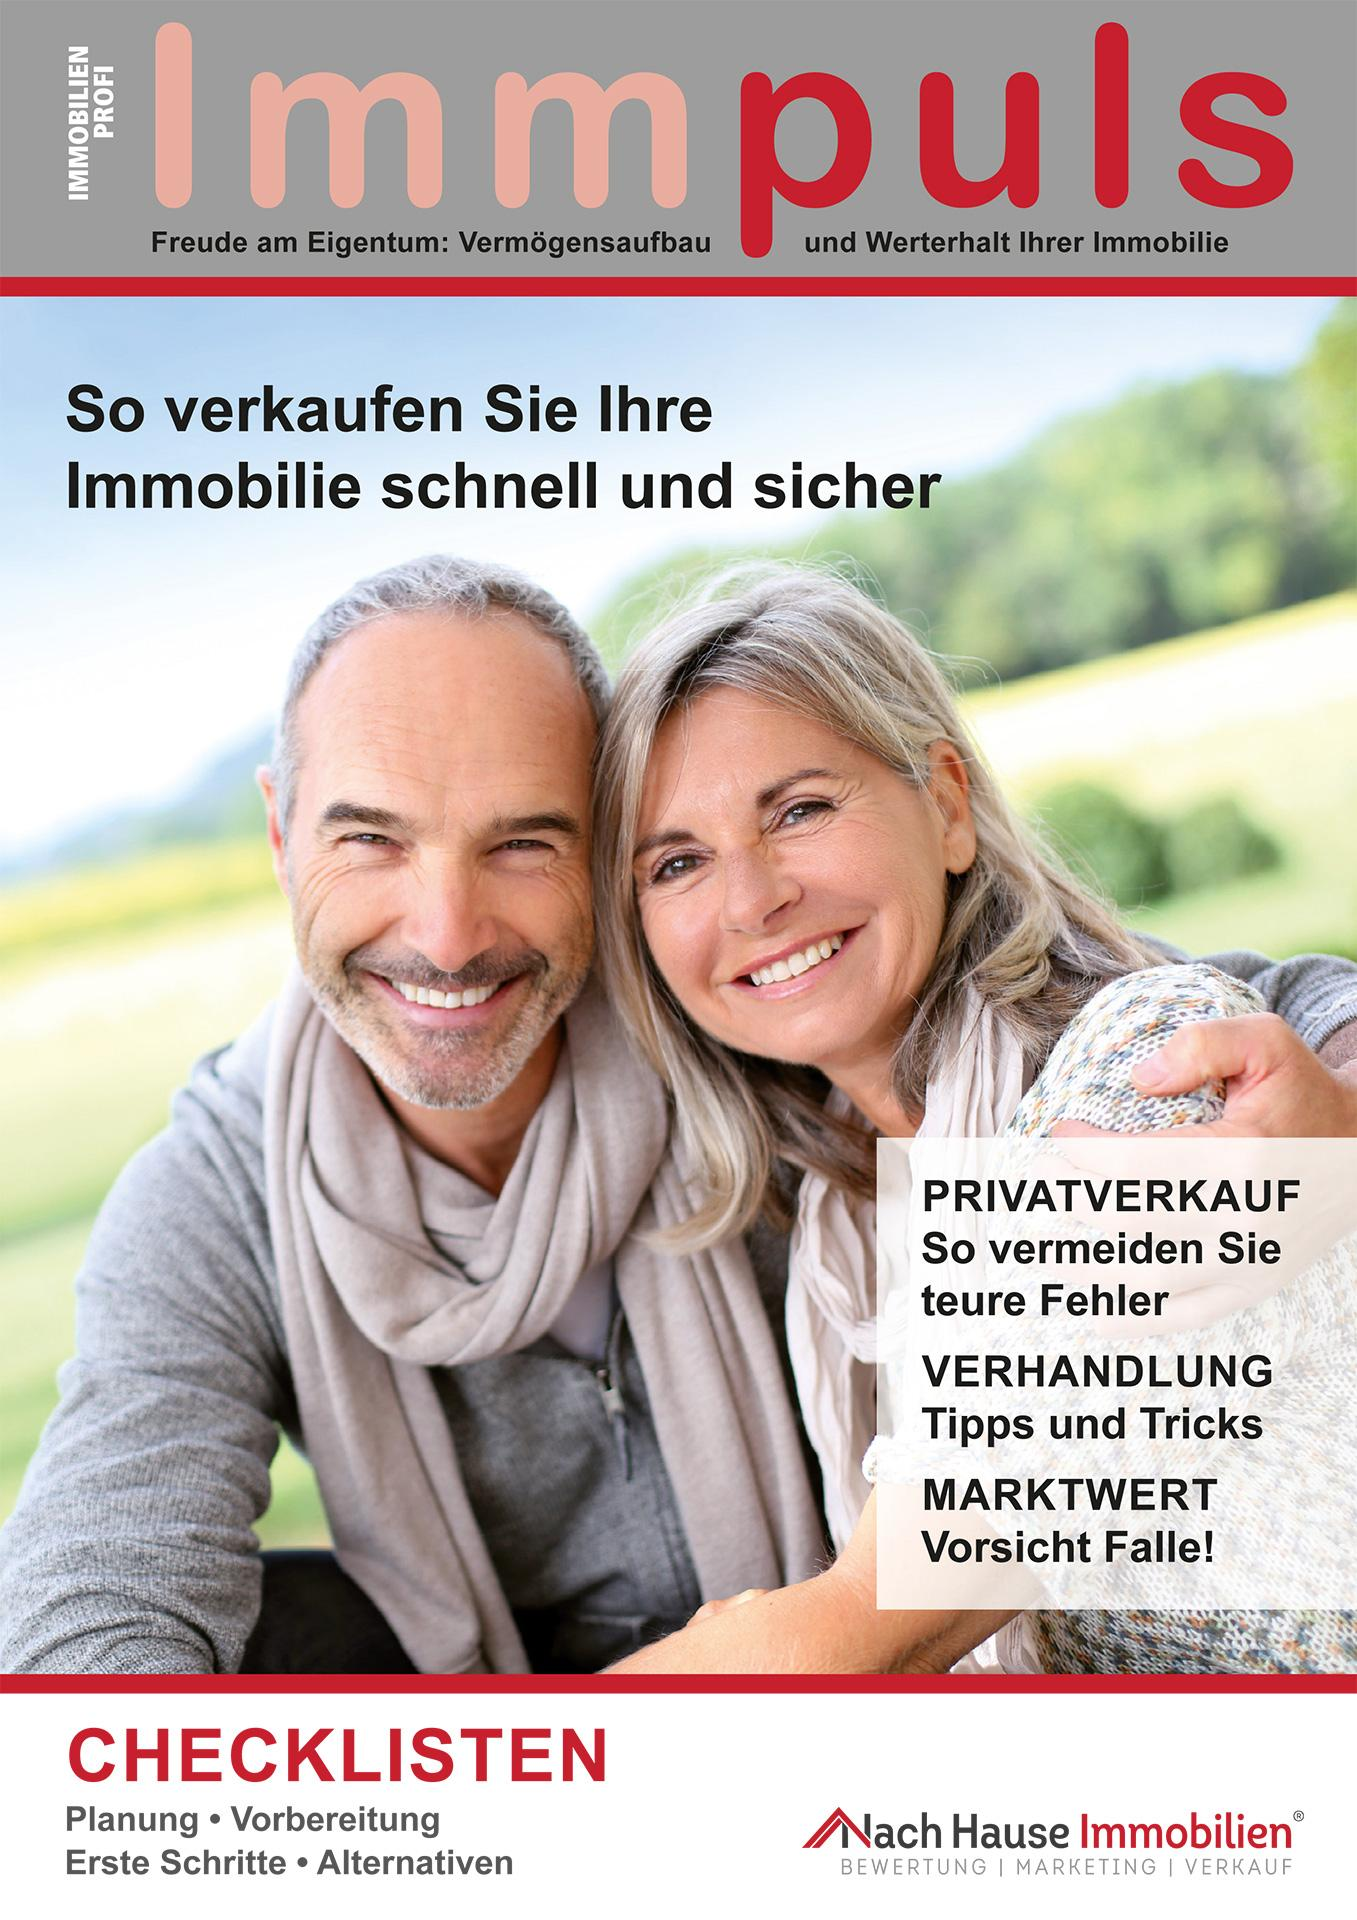 nach-hause-immobilien-immpuls_2021_titelseite Nachhause Immobilien - Ratgeber